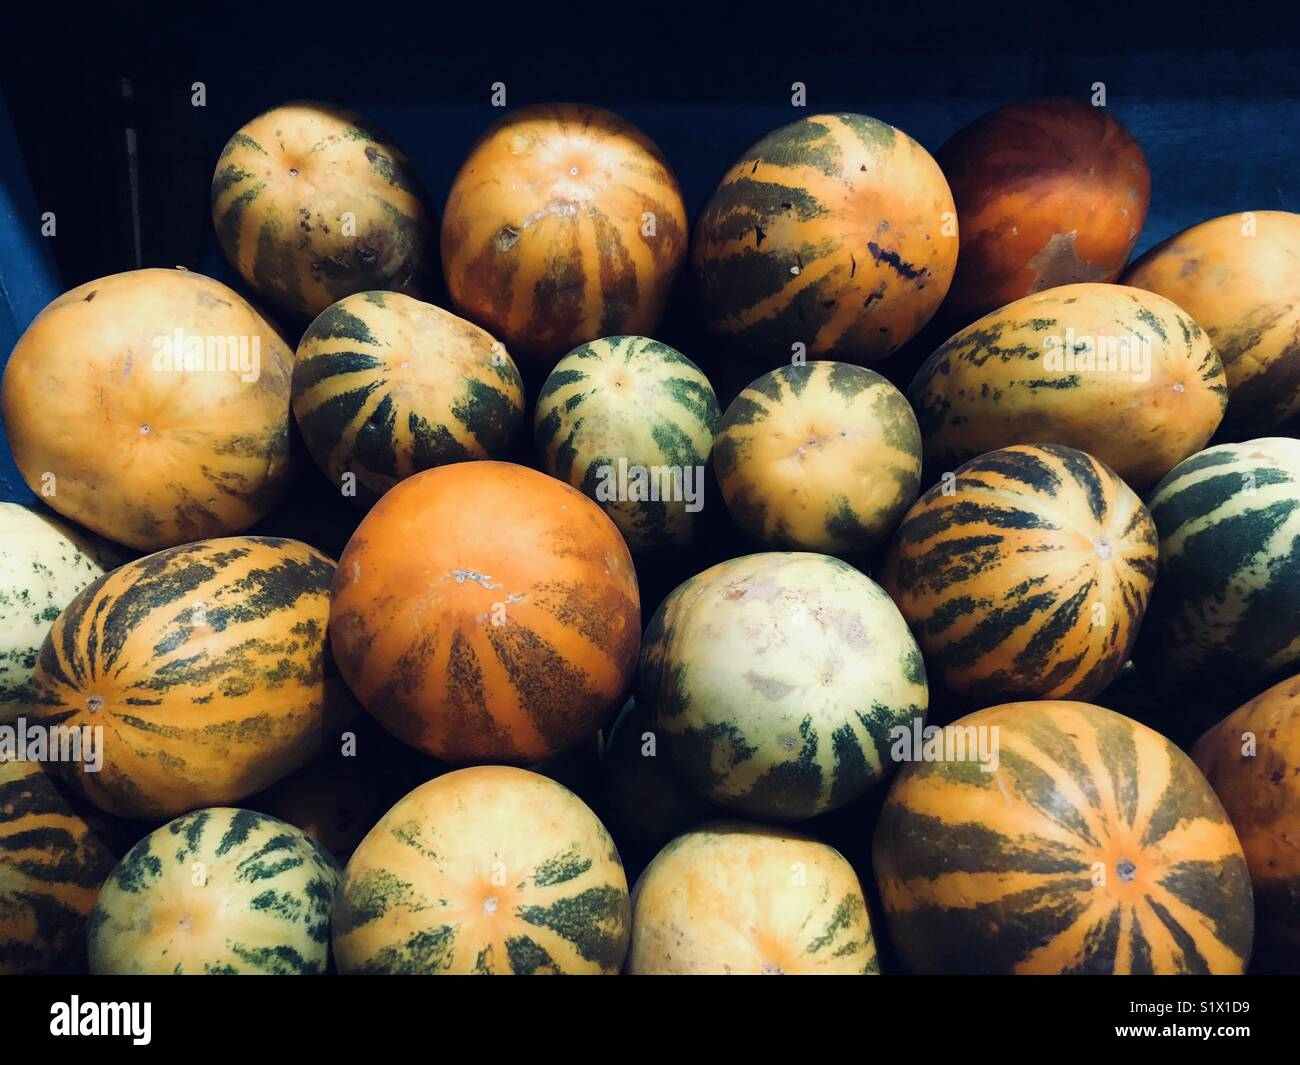 Vegetable Shopping - Stock Image